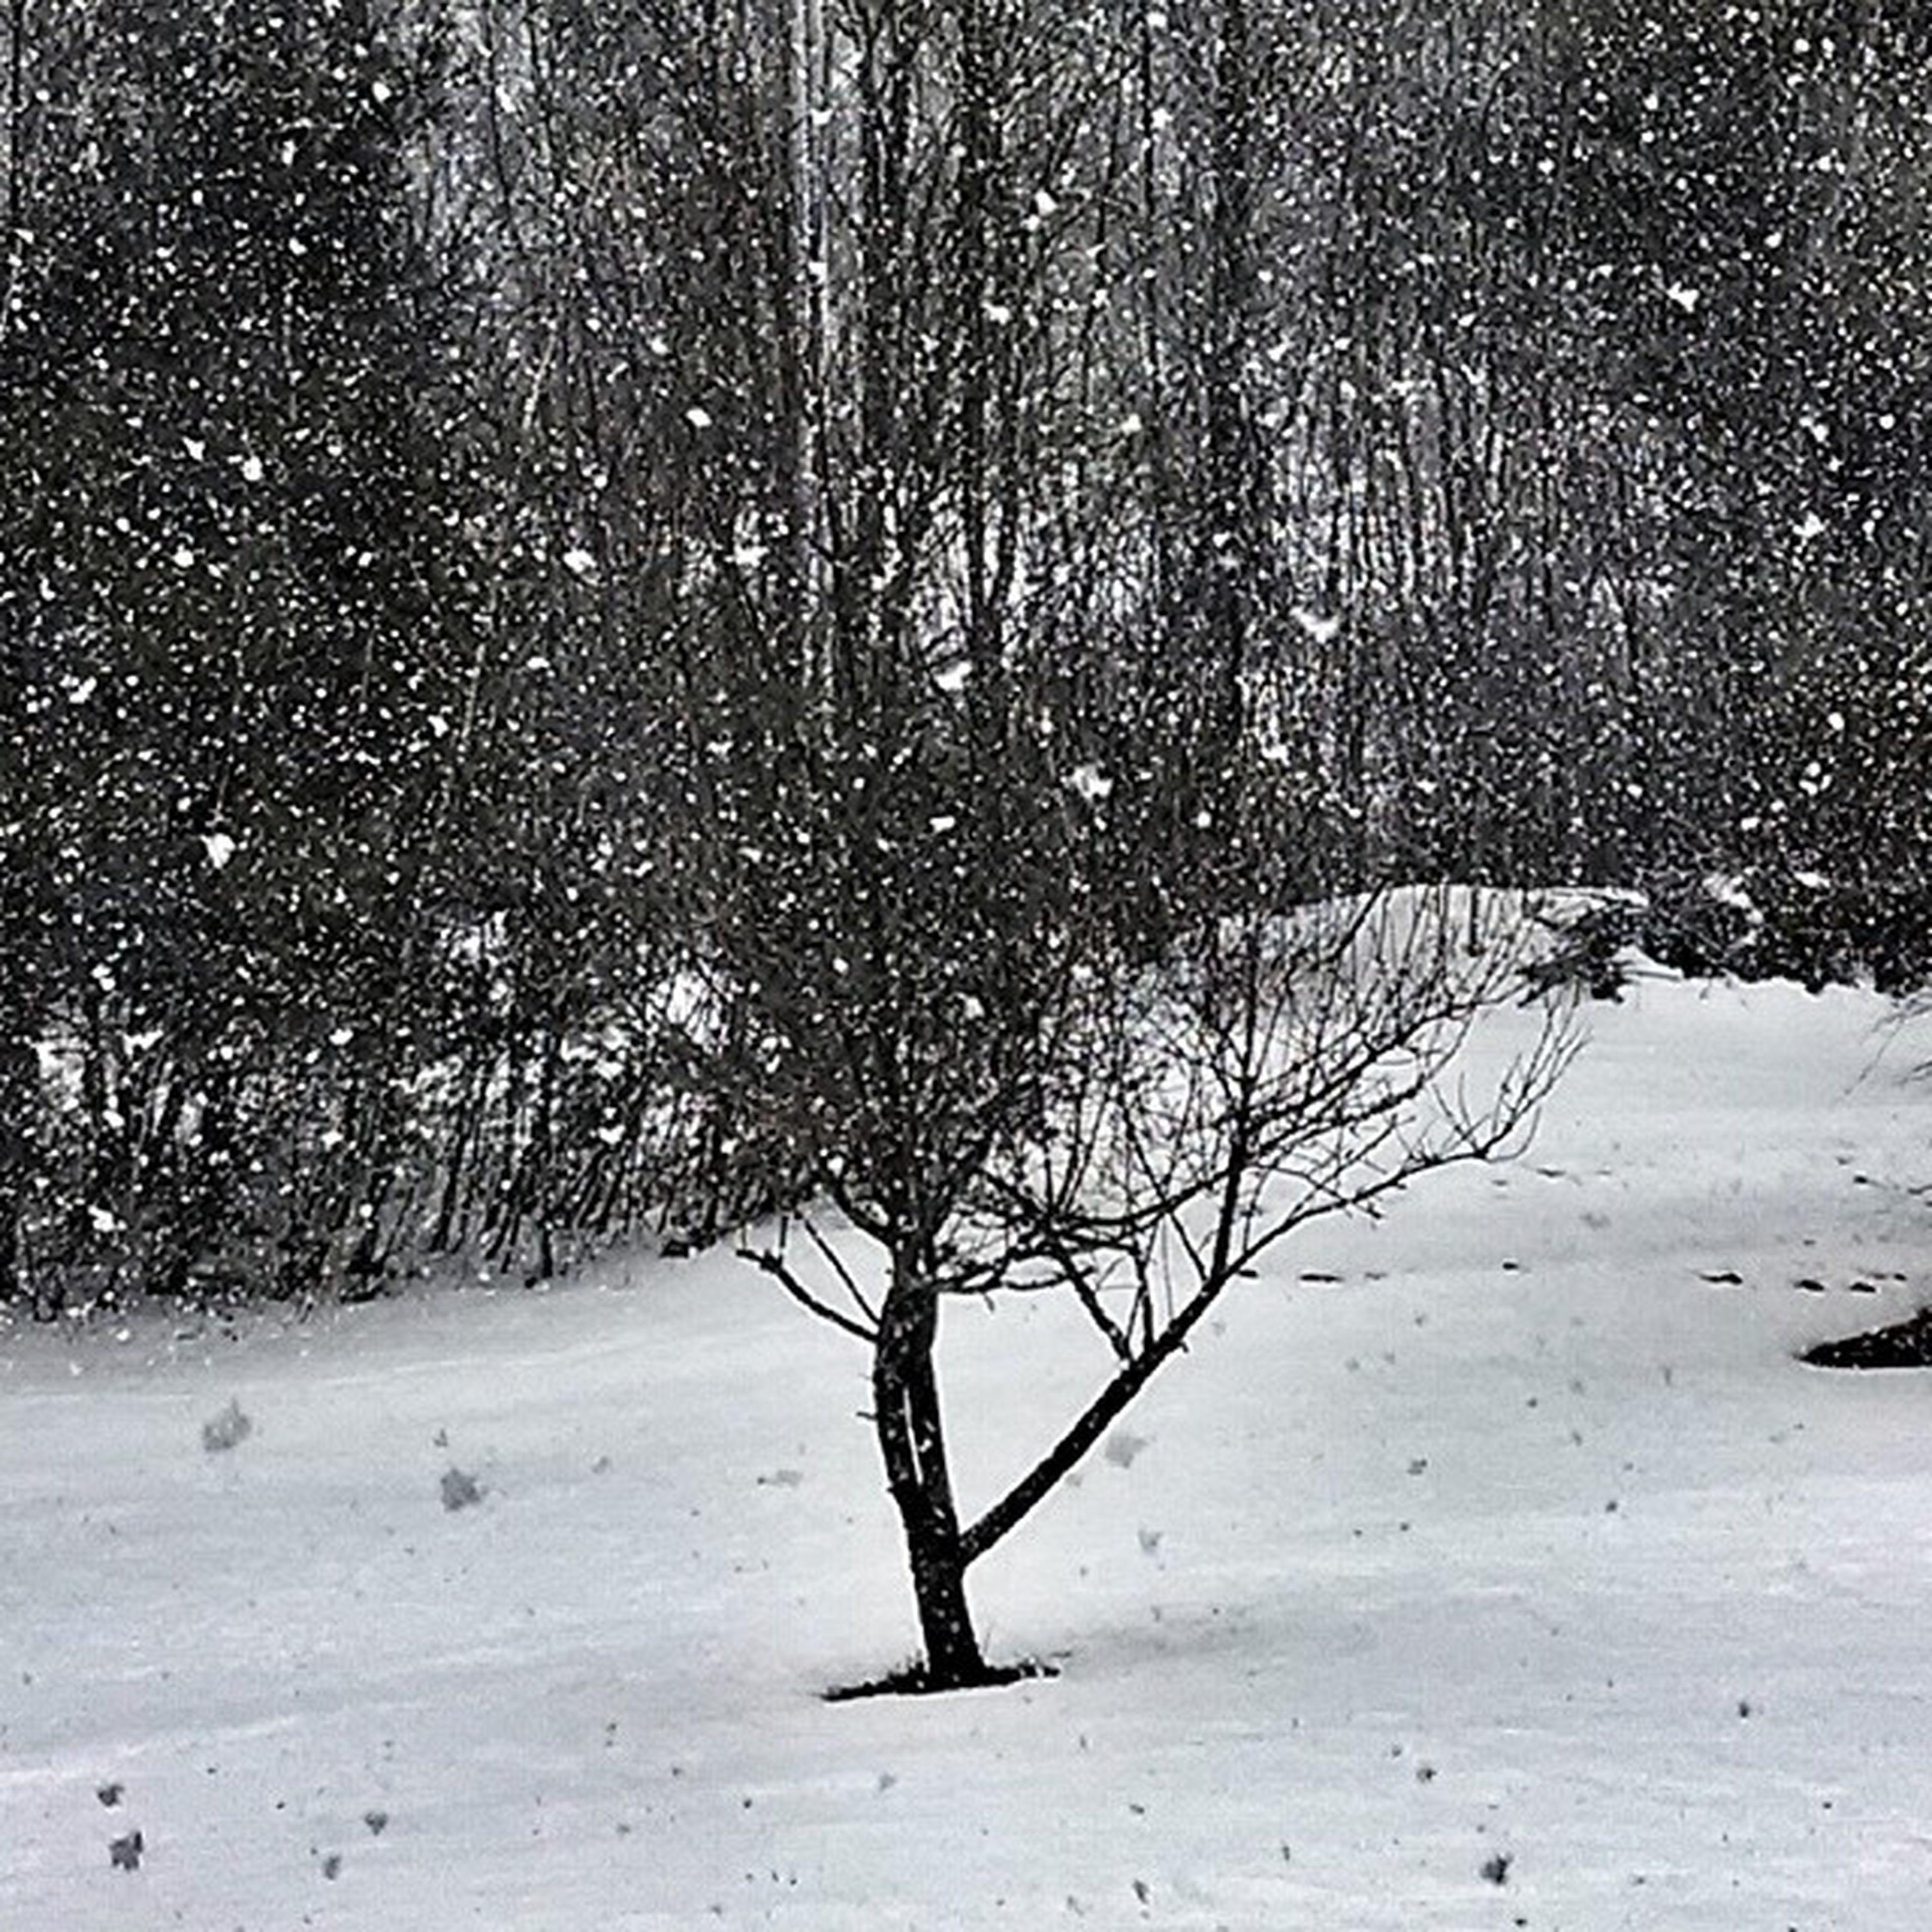 Snowing!